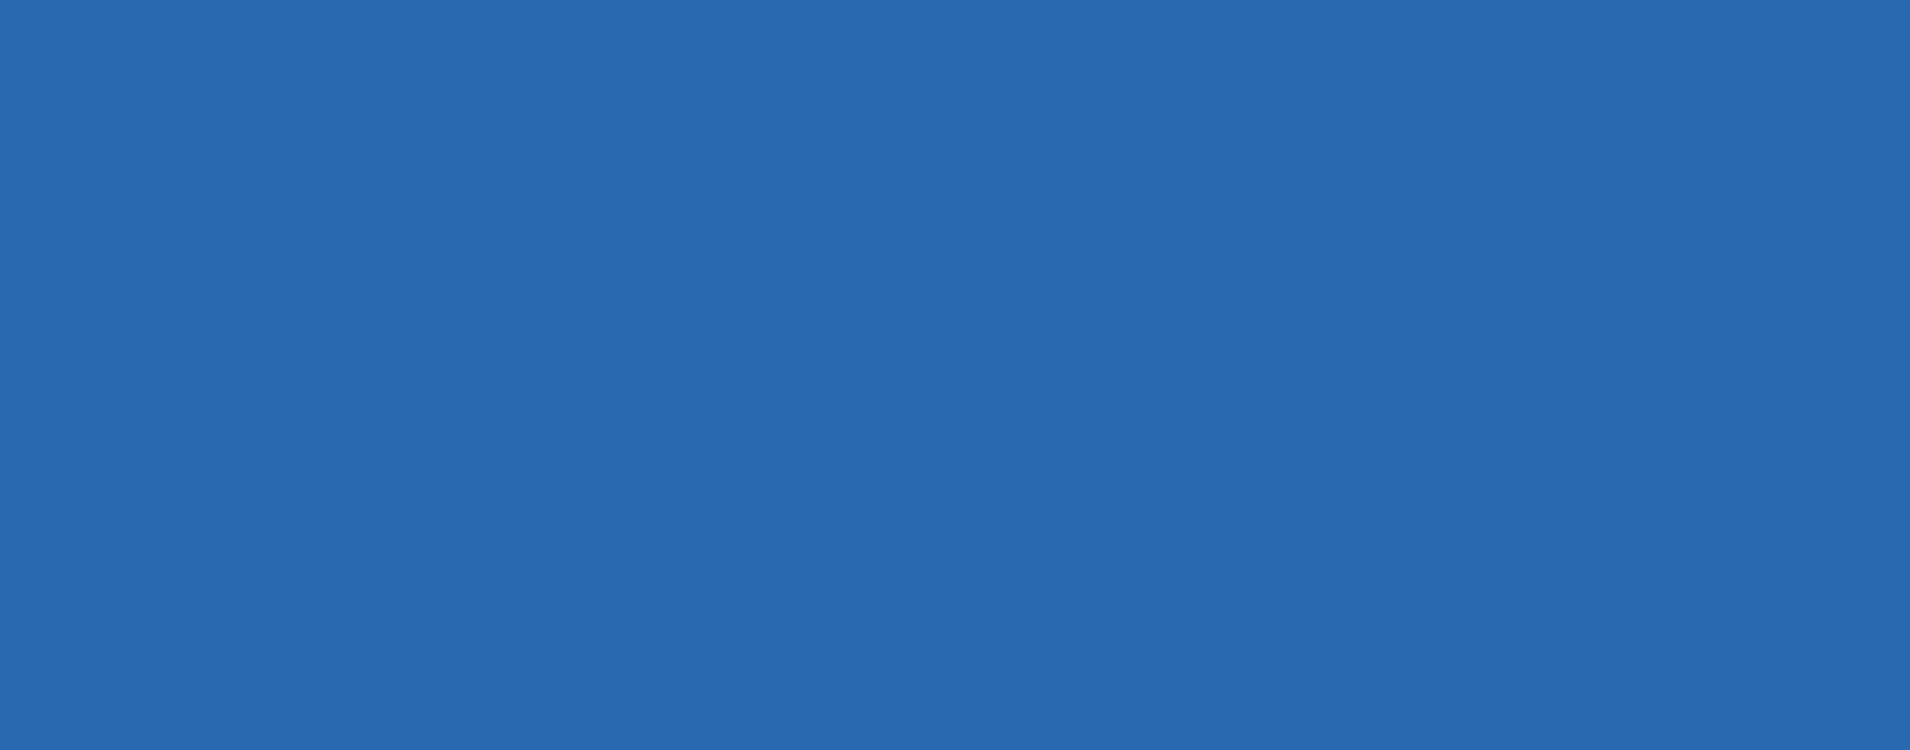 bleu d'écran